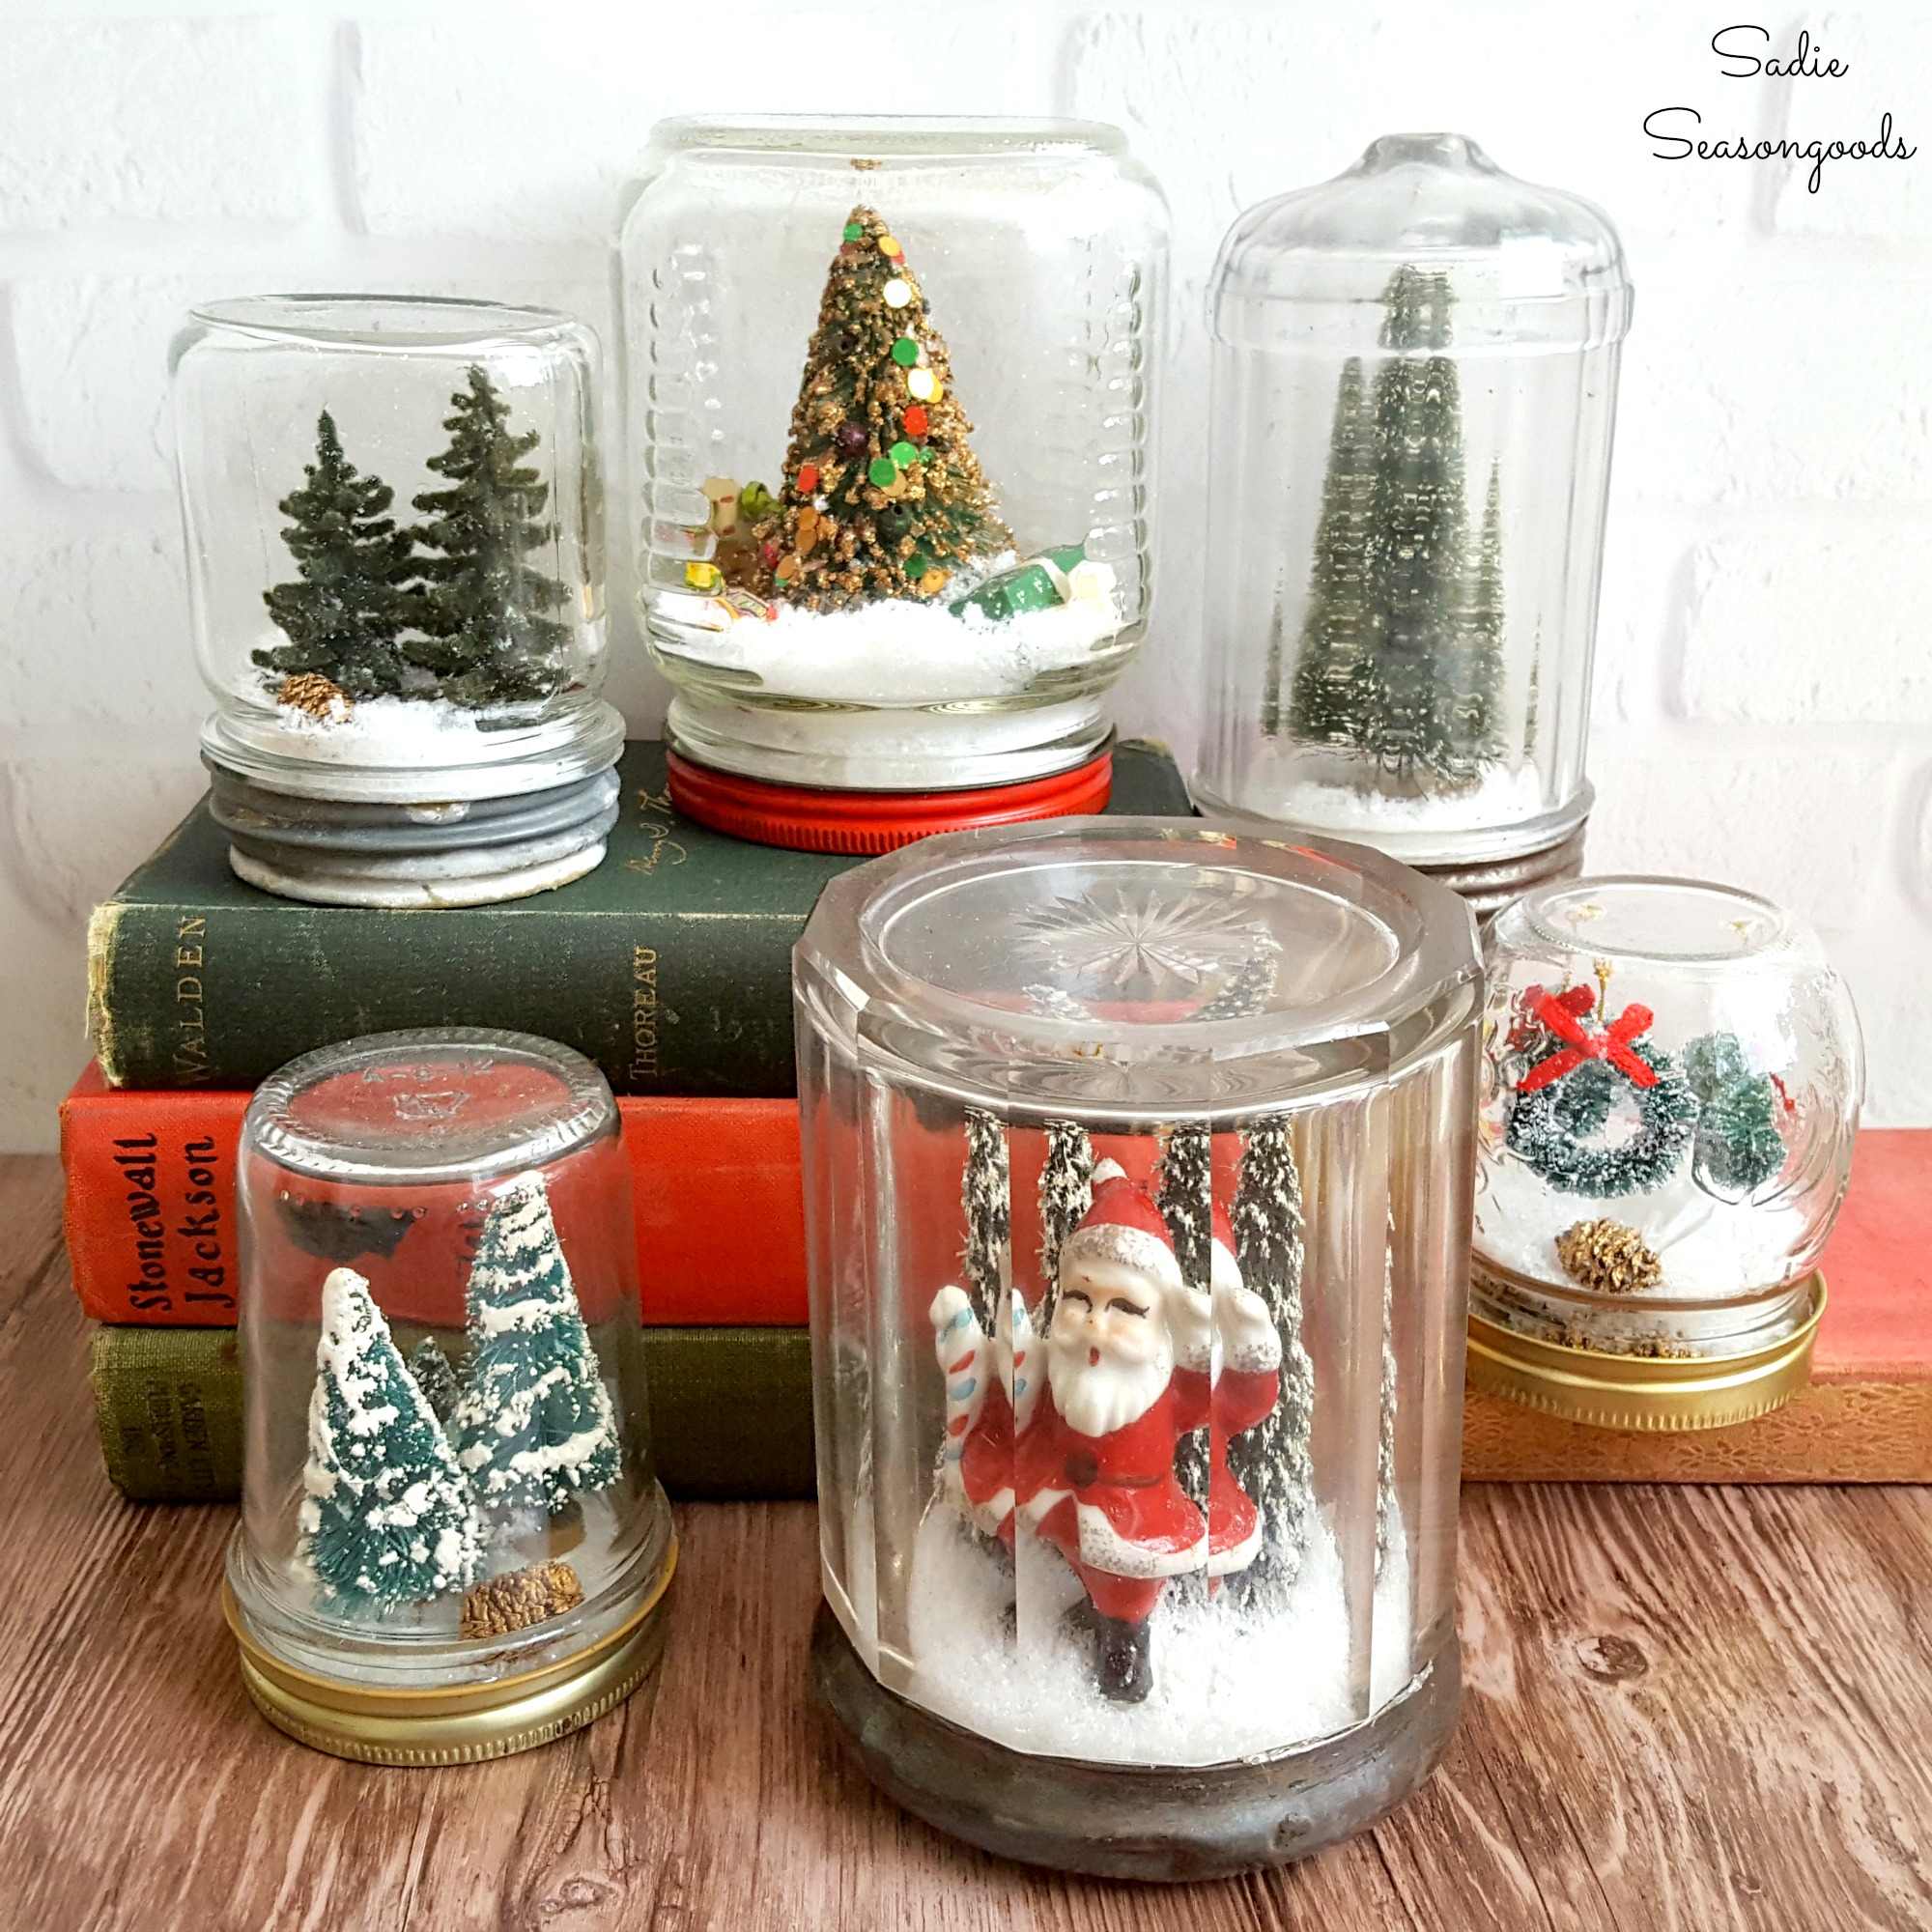 Antique jar DIY snow globes, by Sadie Seasongoods, featured on Funky Junk Interiors